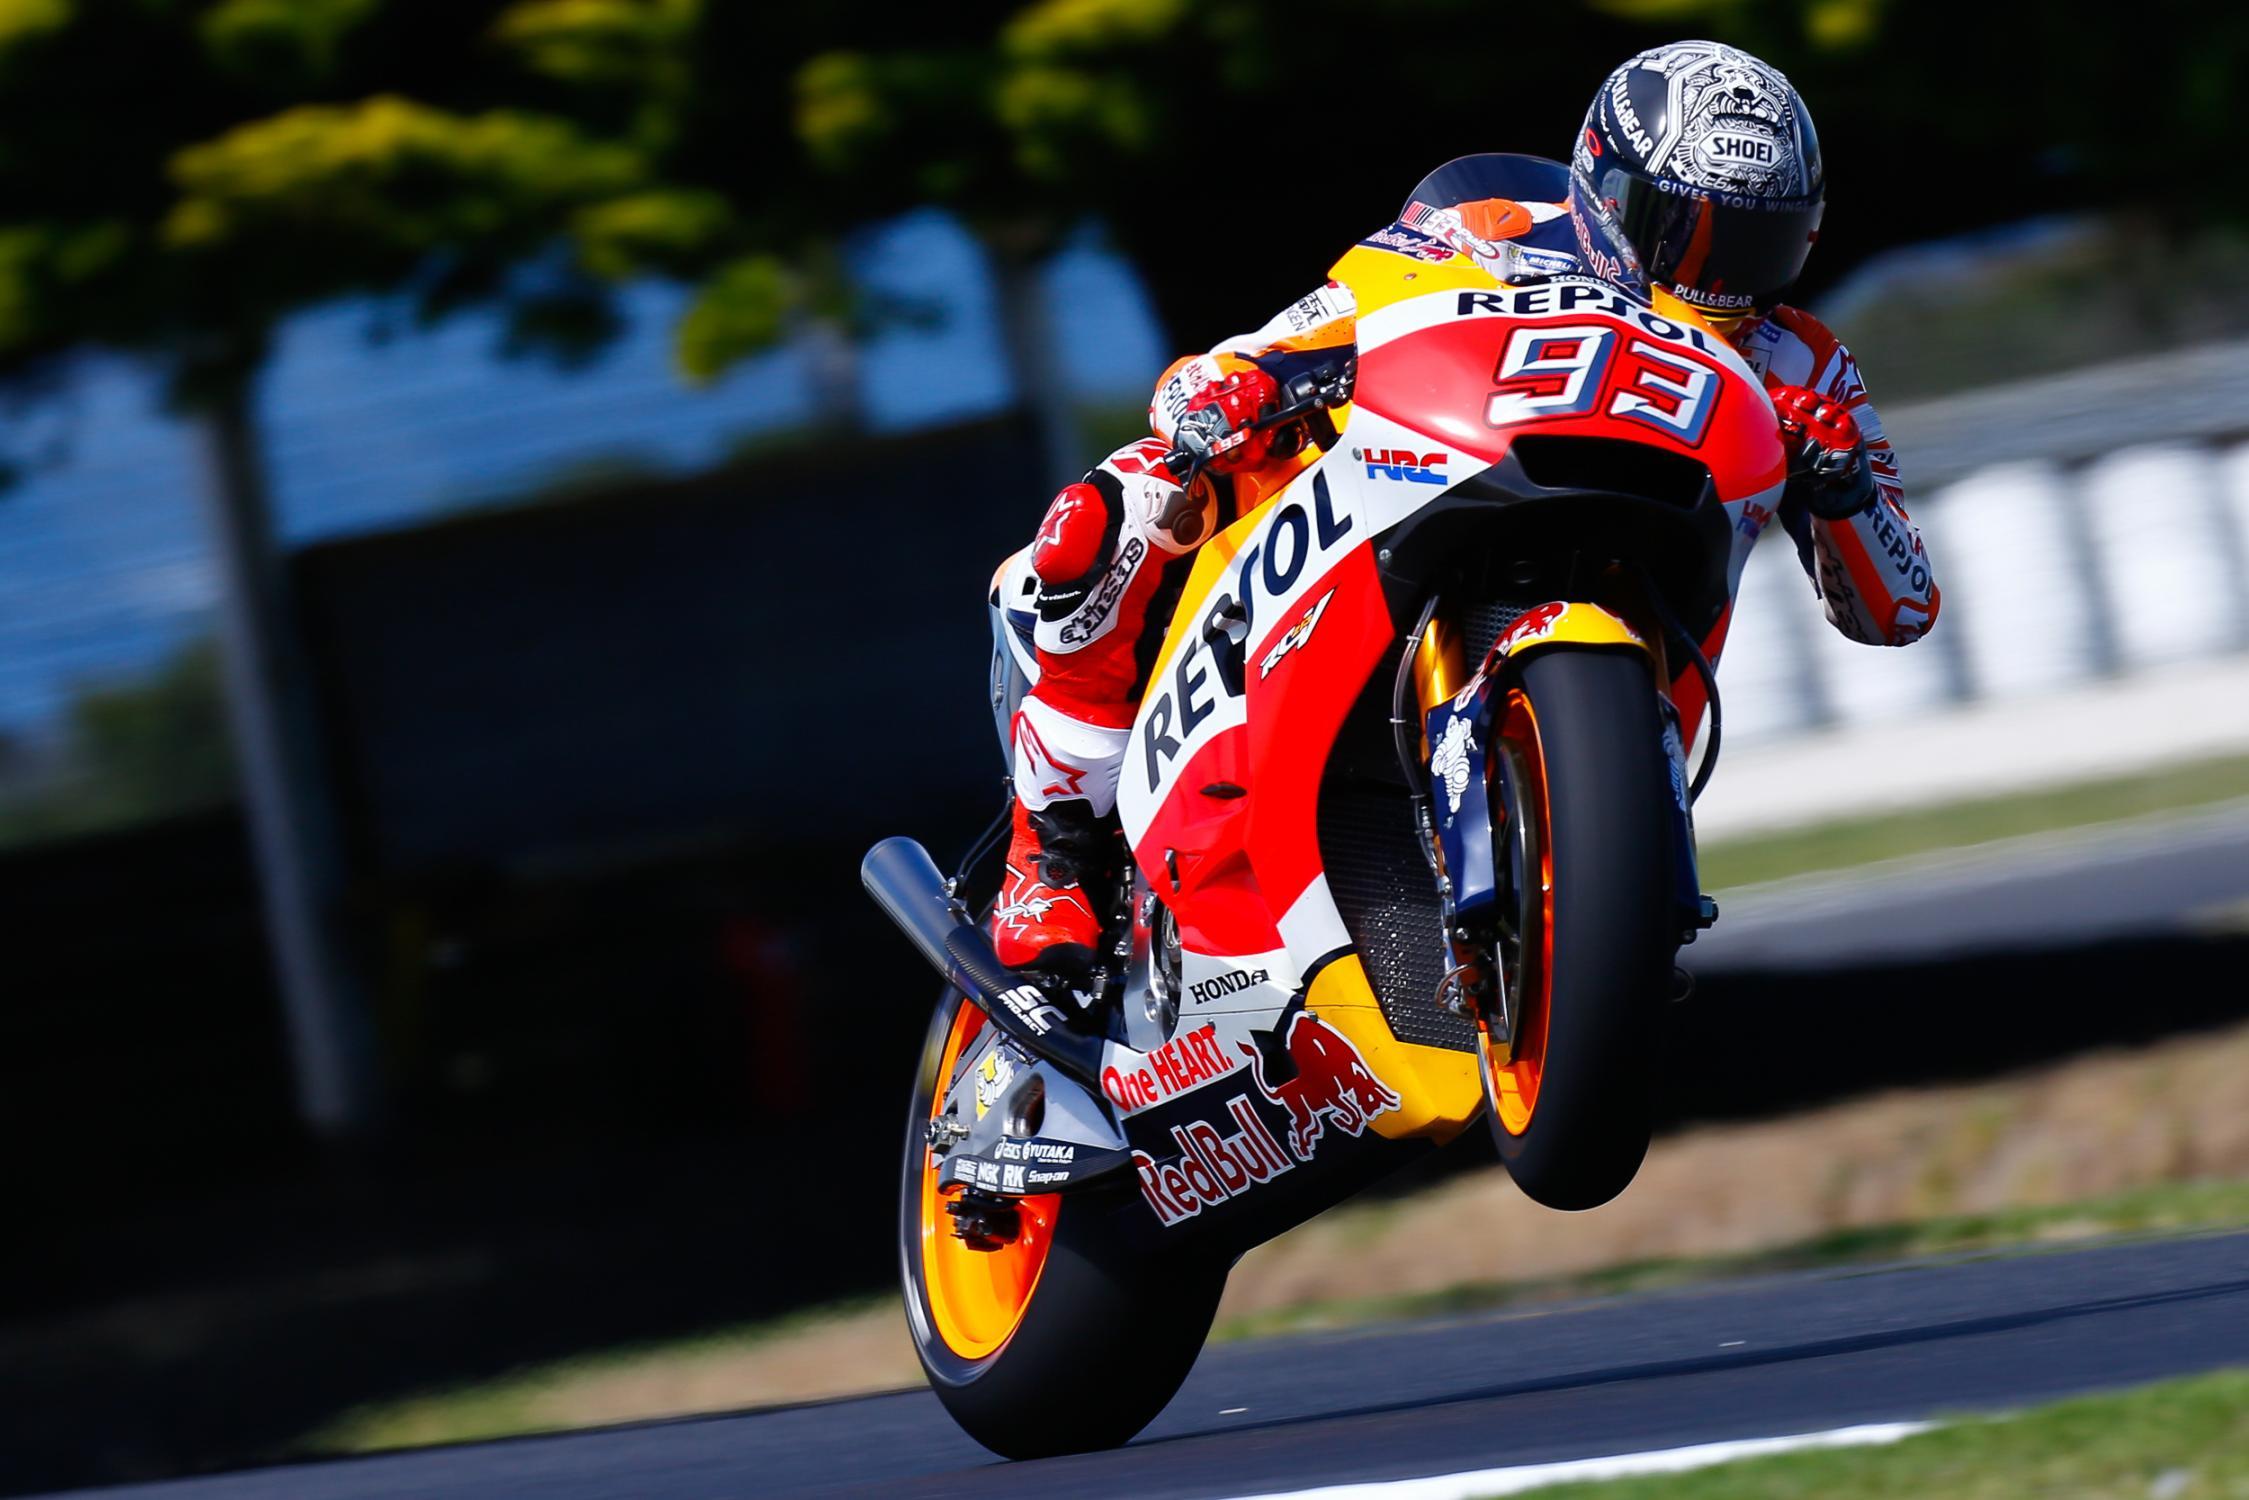 [MotoGP] Test Phillip Island 93-marc-marquez-esp-2017-action-australia-motogp-phillip-island-pre-season-test01634_test2017_ambience.gallery_full_top_fullscreen